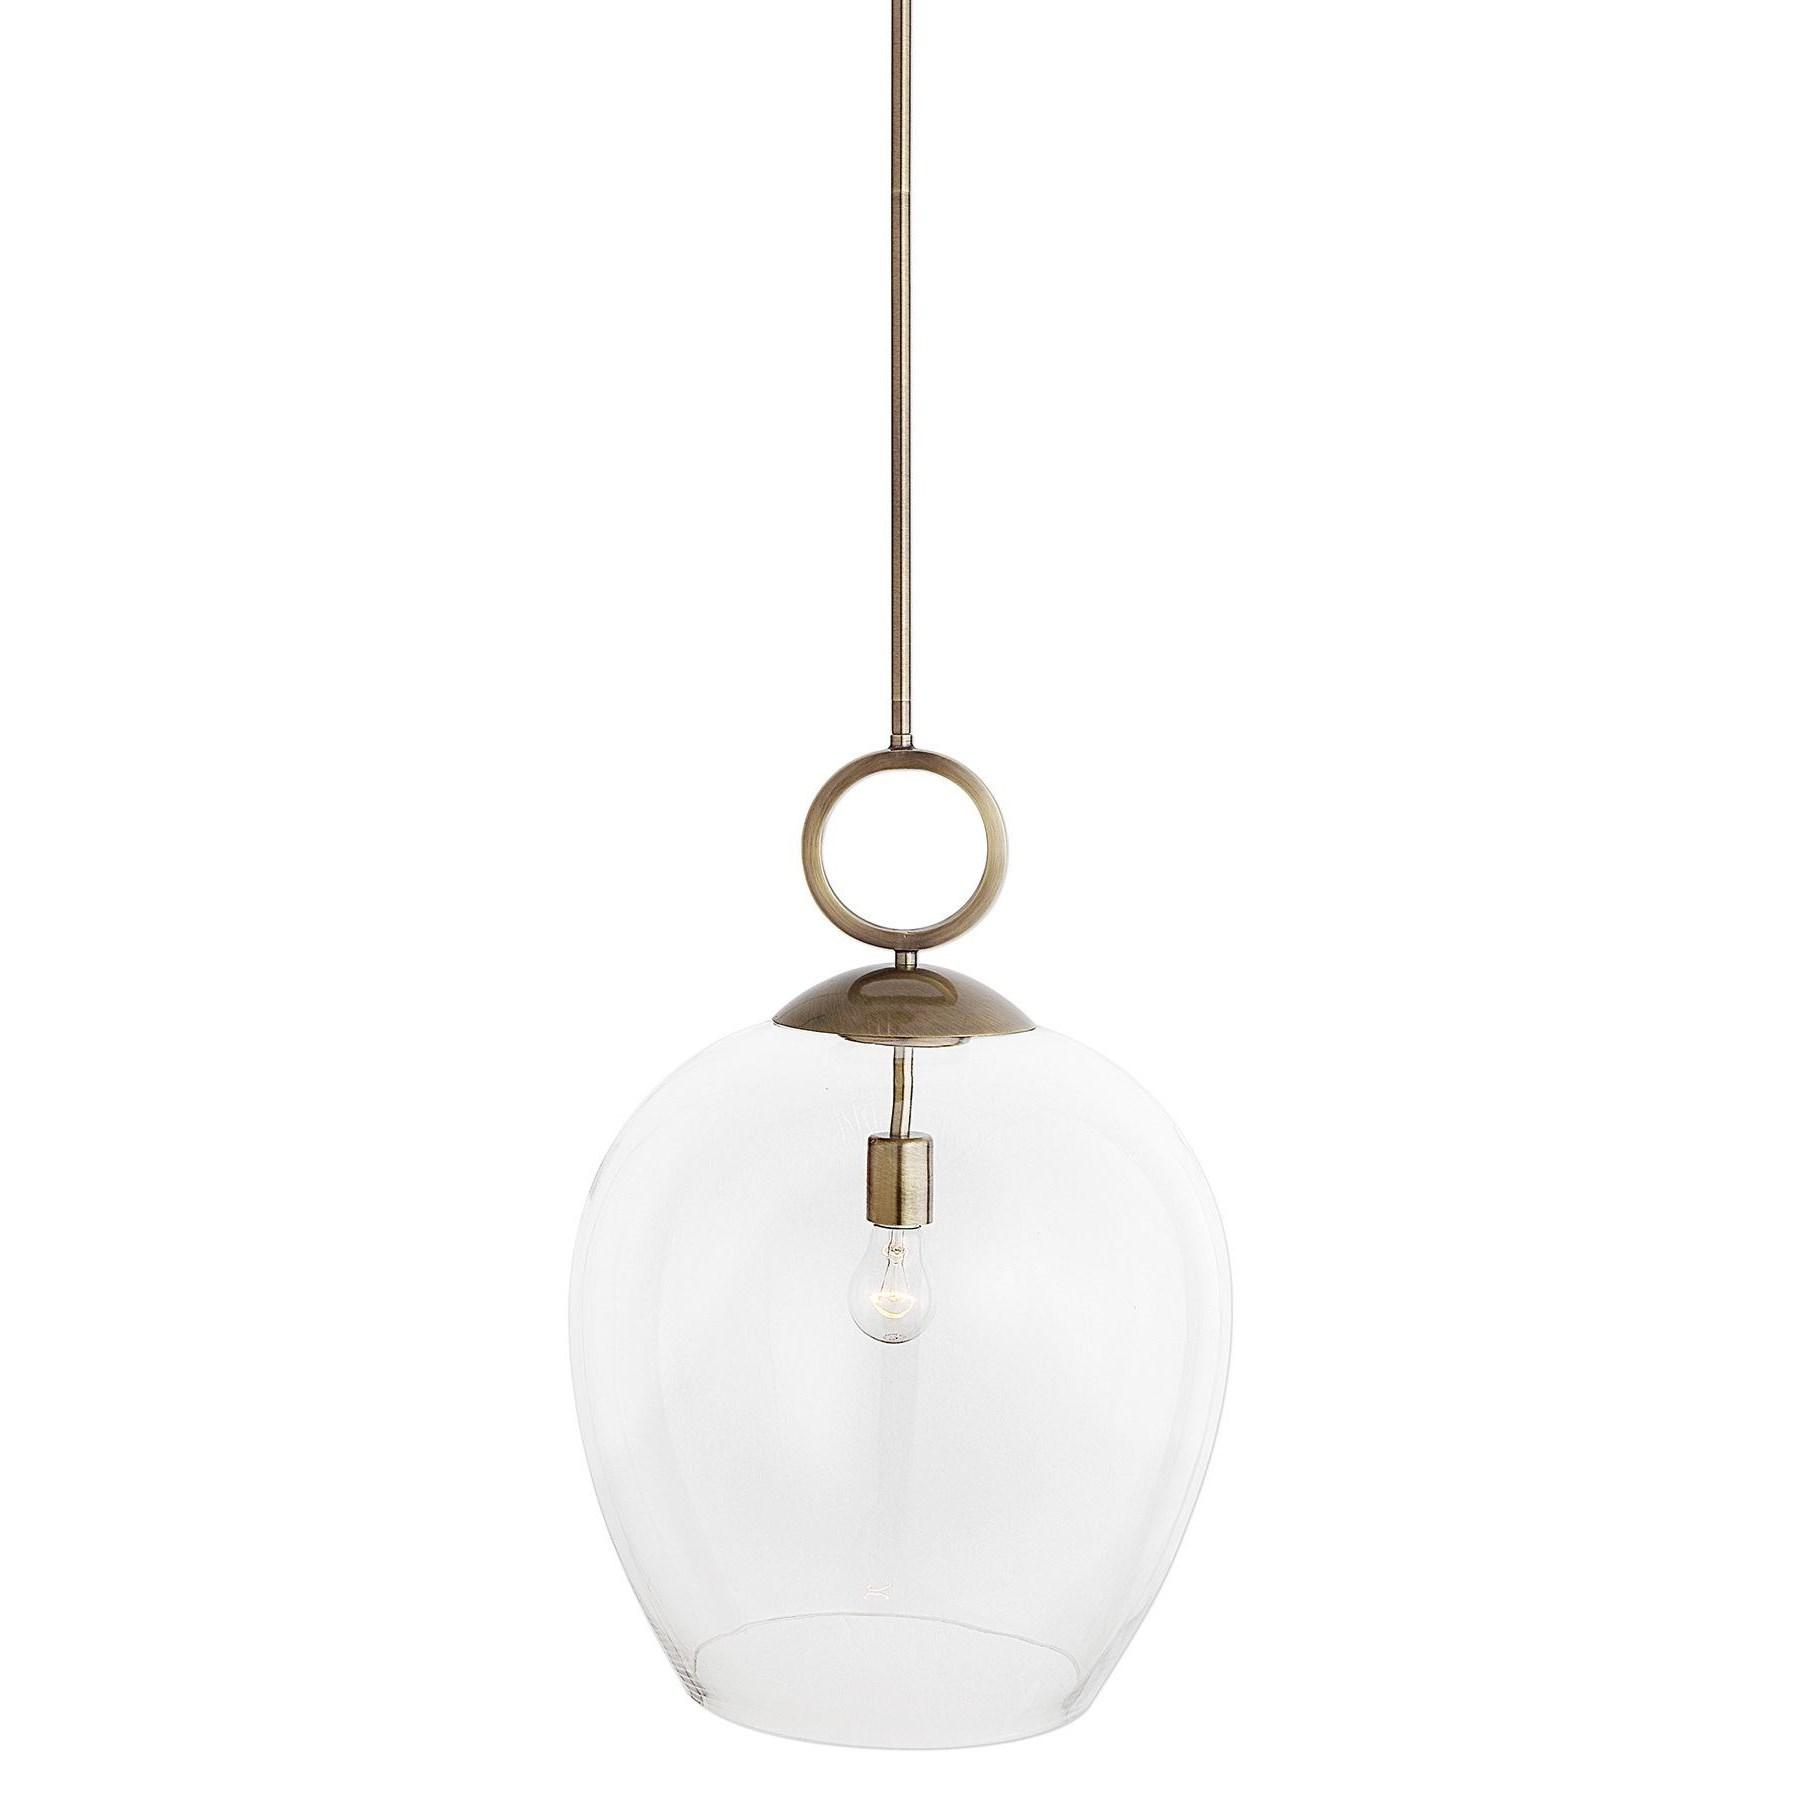 Lighting Fixtures - Pendant Lights Calix Large Blown Glass 1 Light Pendant by Uttermost at Suburban Furniture